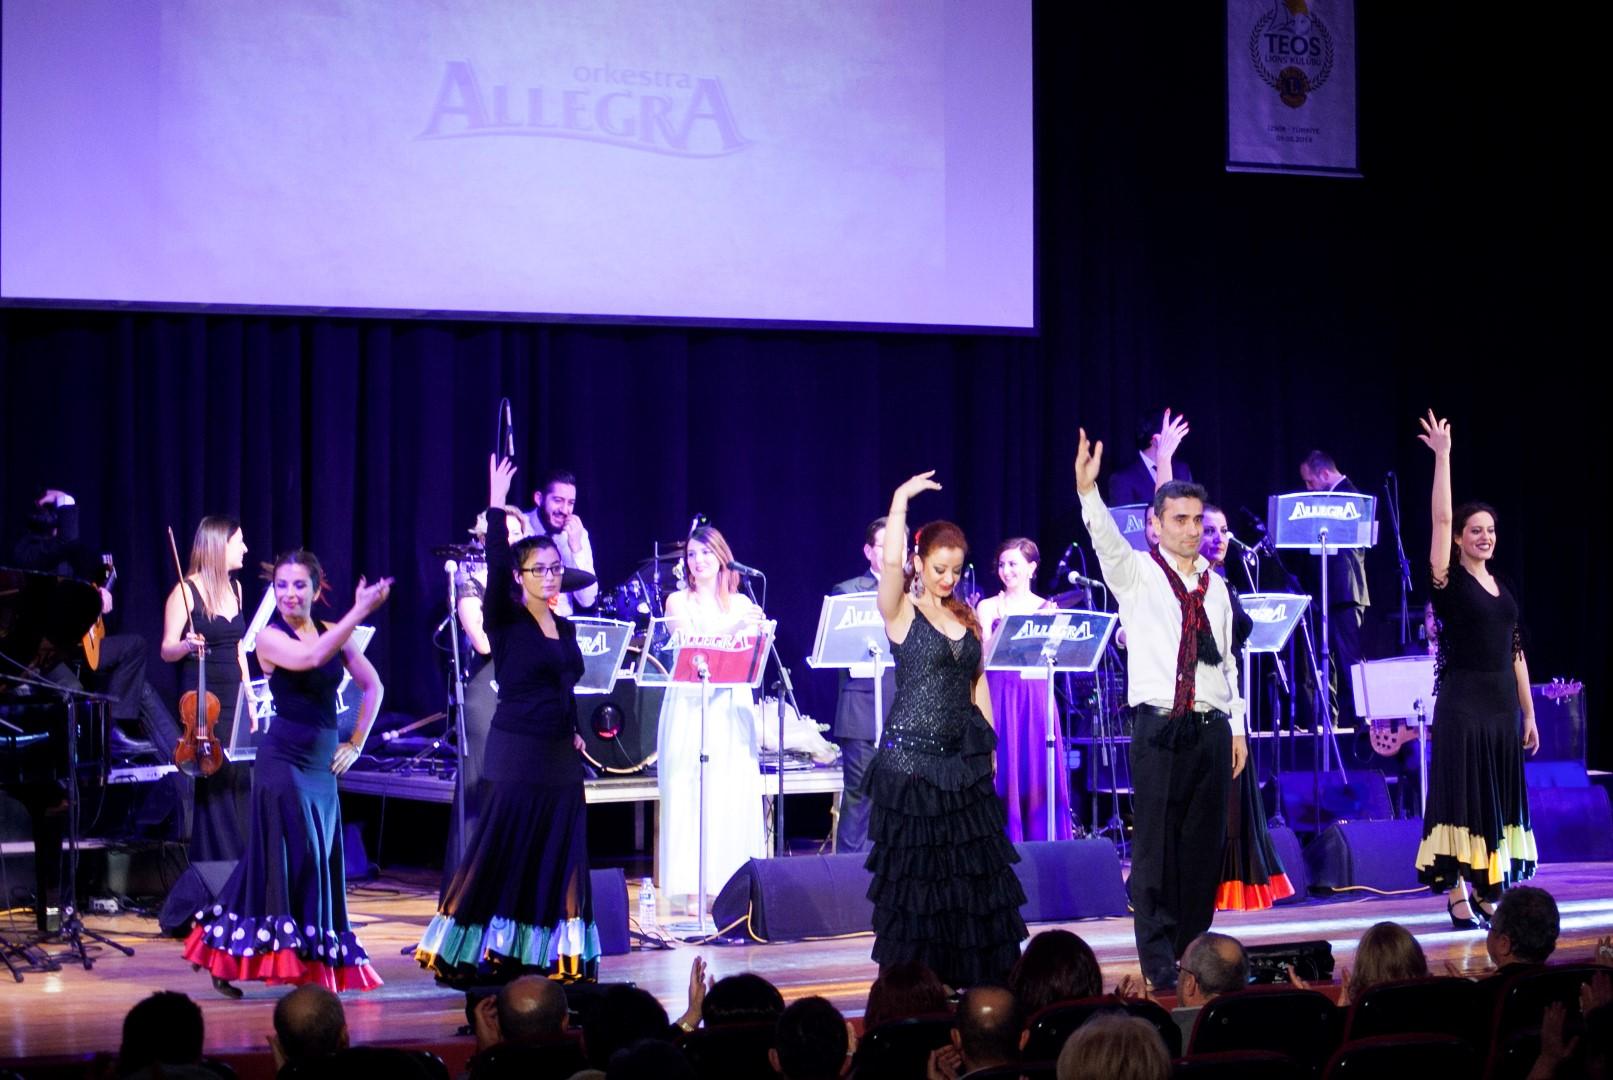 orkestra-allegra (6)